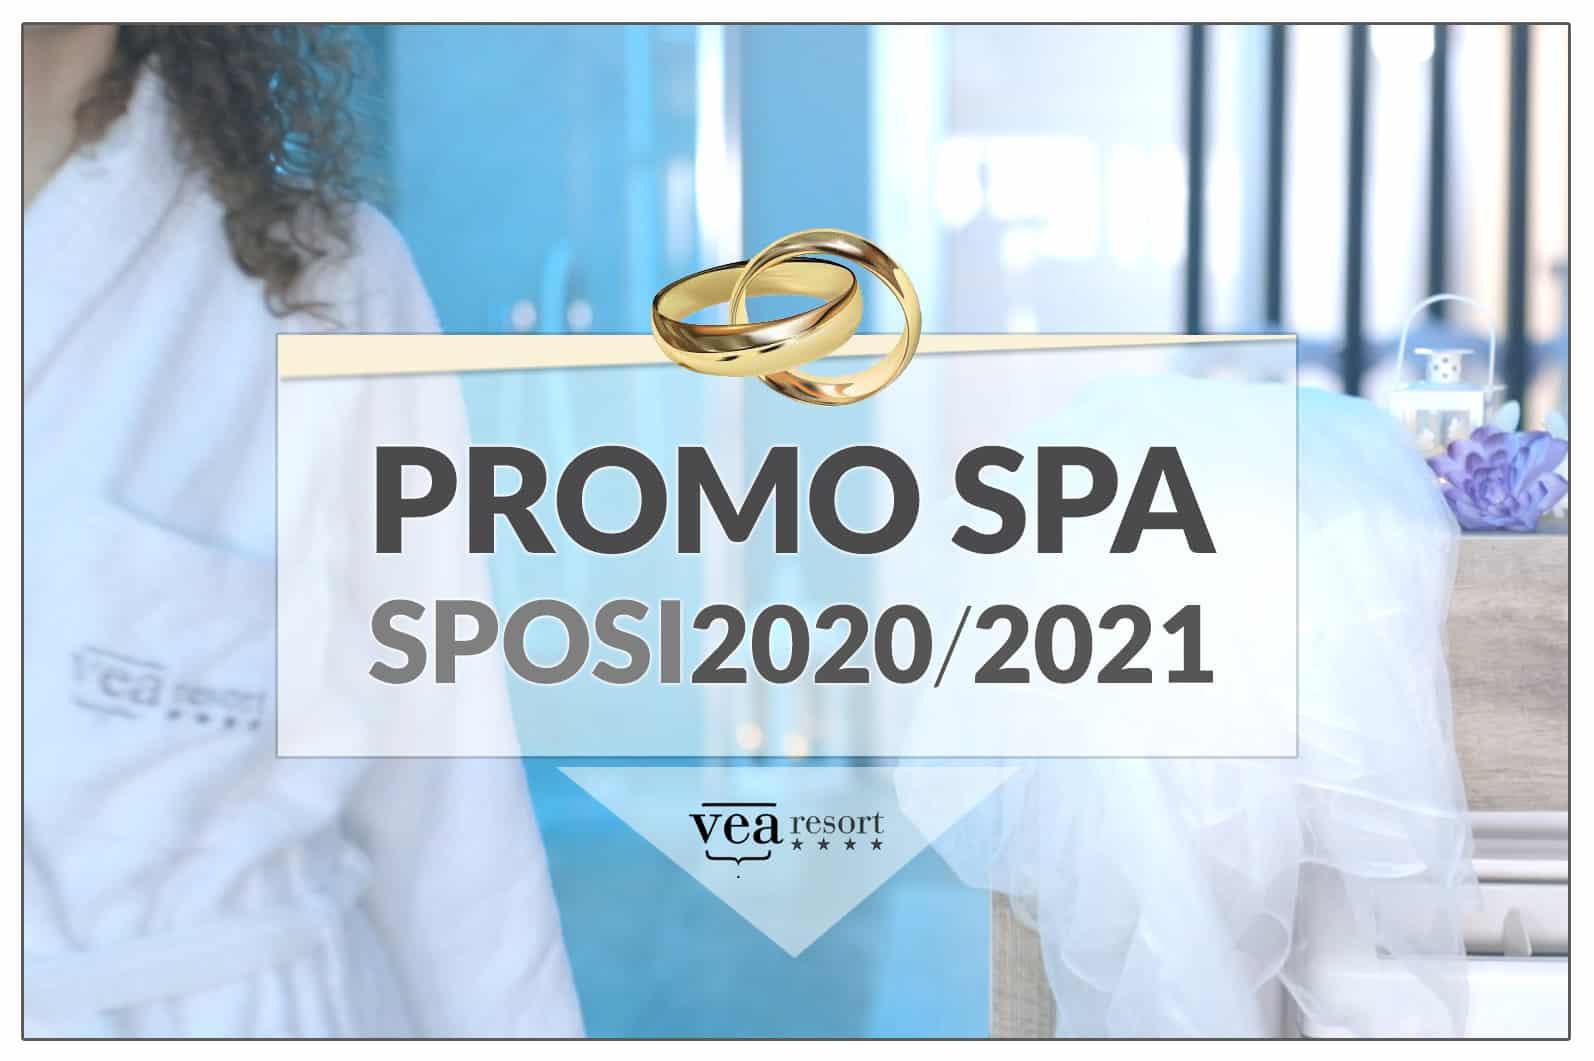 Novità Sposi 2020/2021